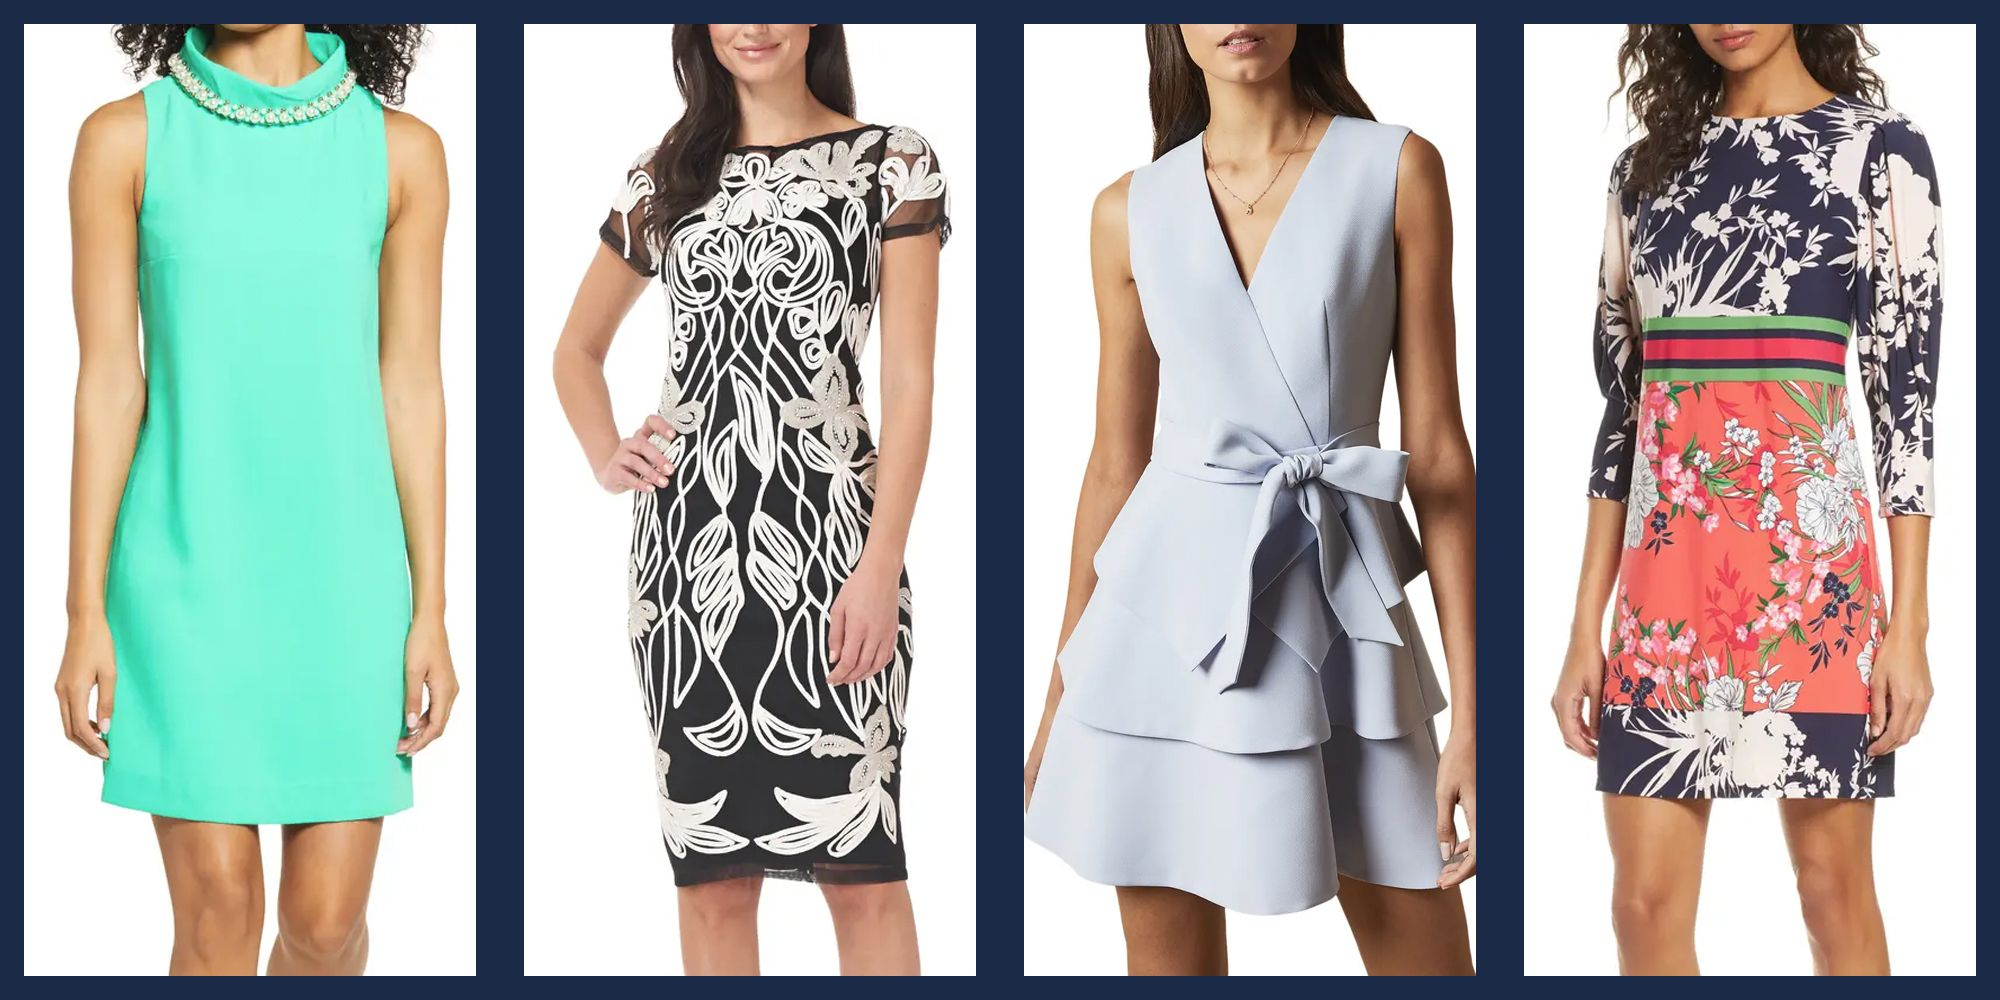 15 Chic Kentucky Derby Dresses 2021 Best Derby Day Dress Ideas For Women